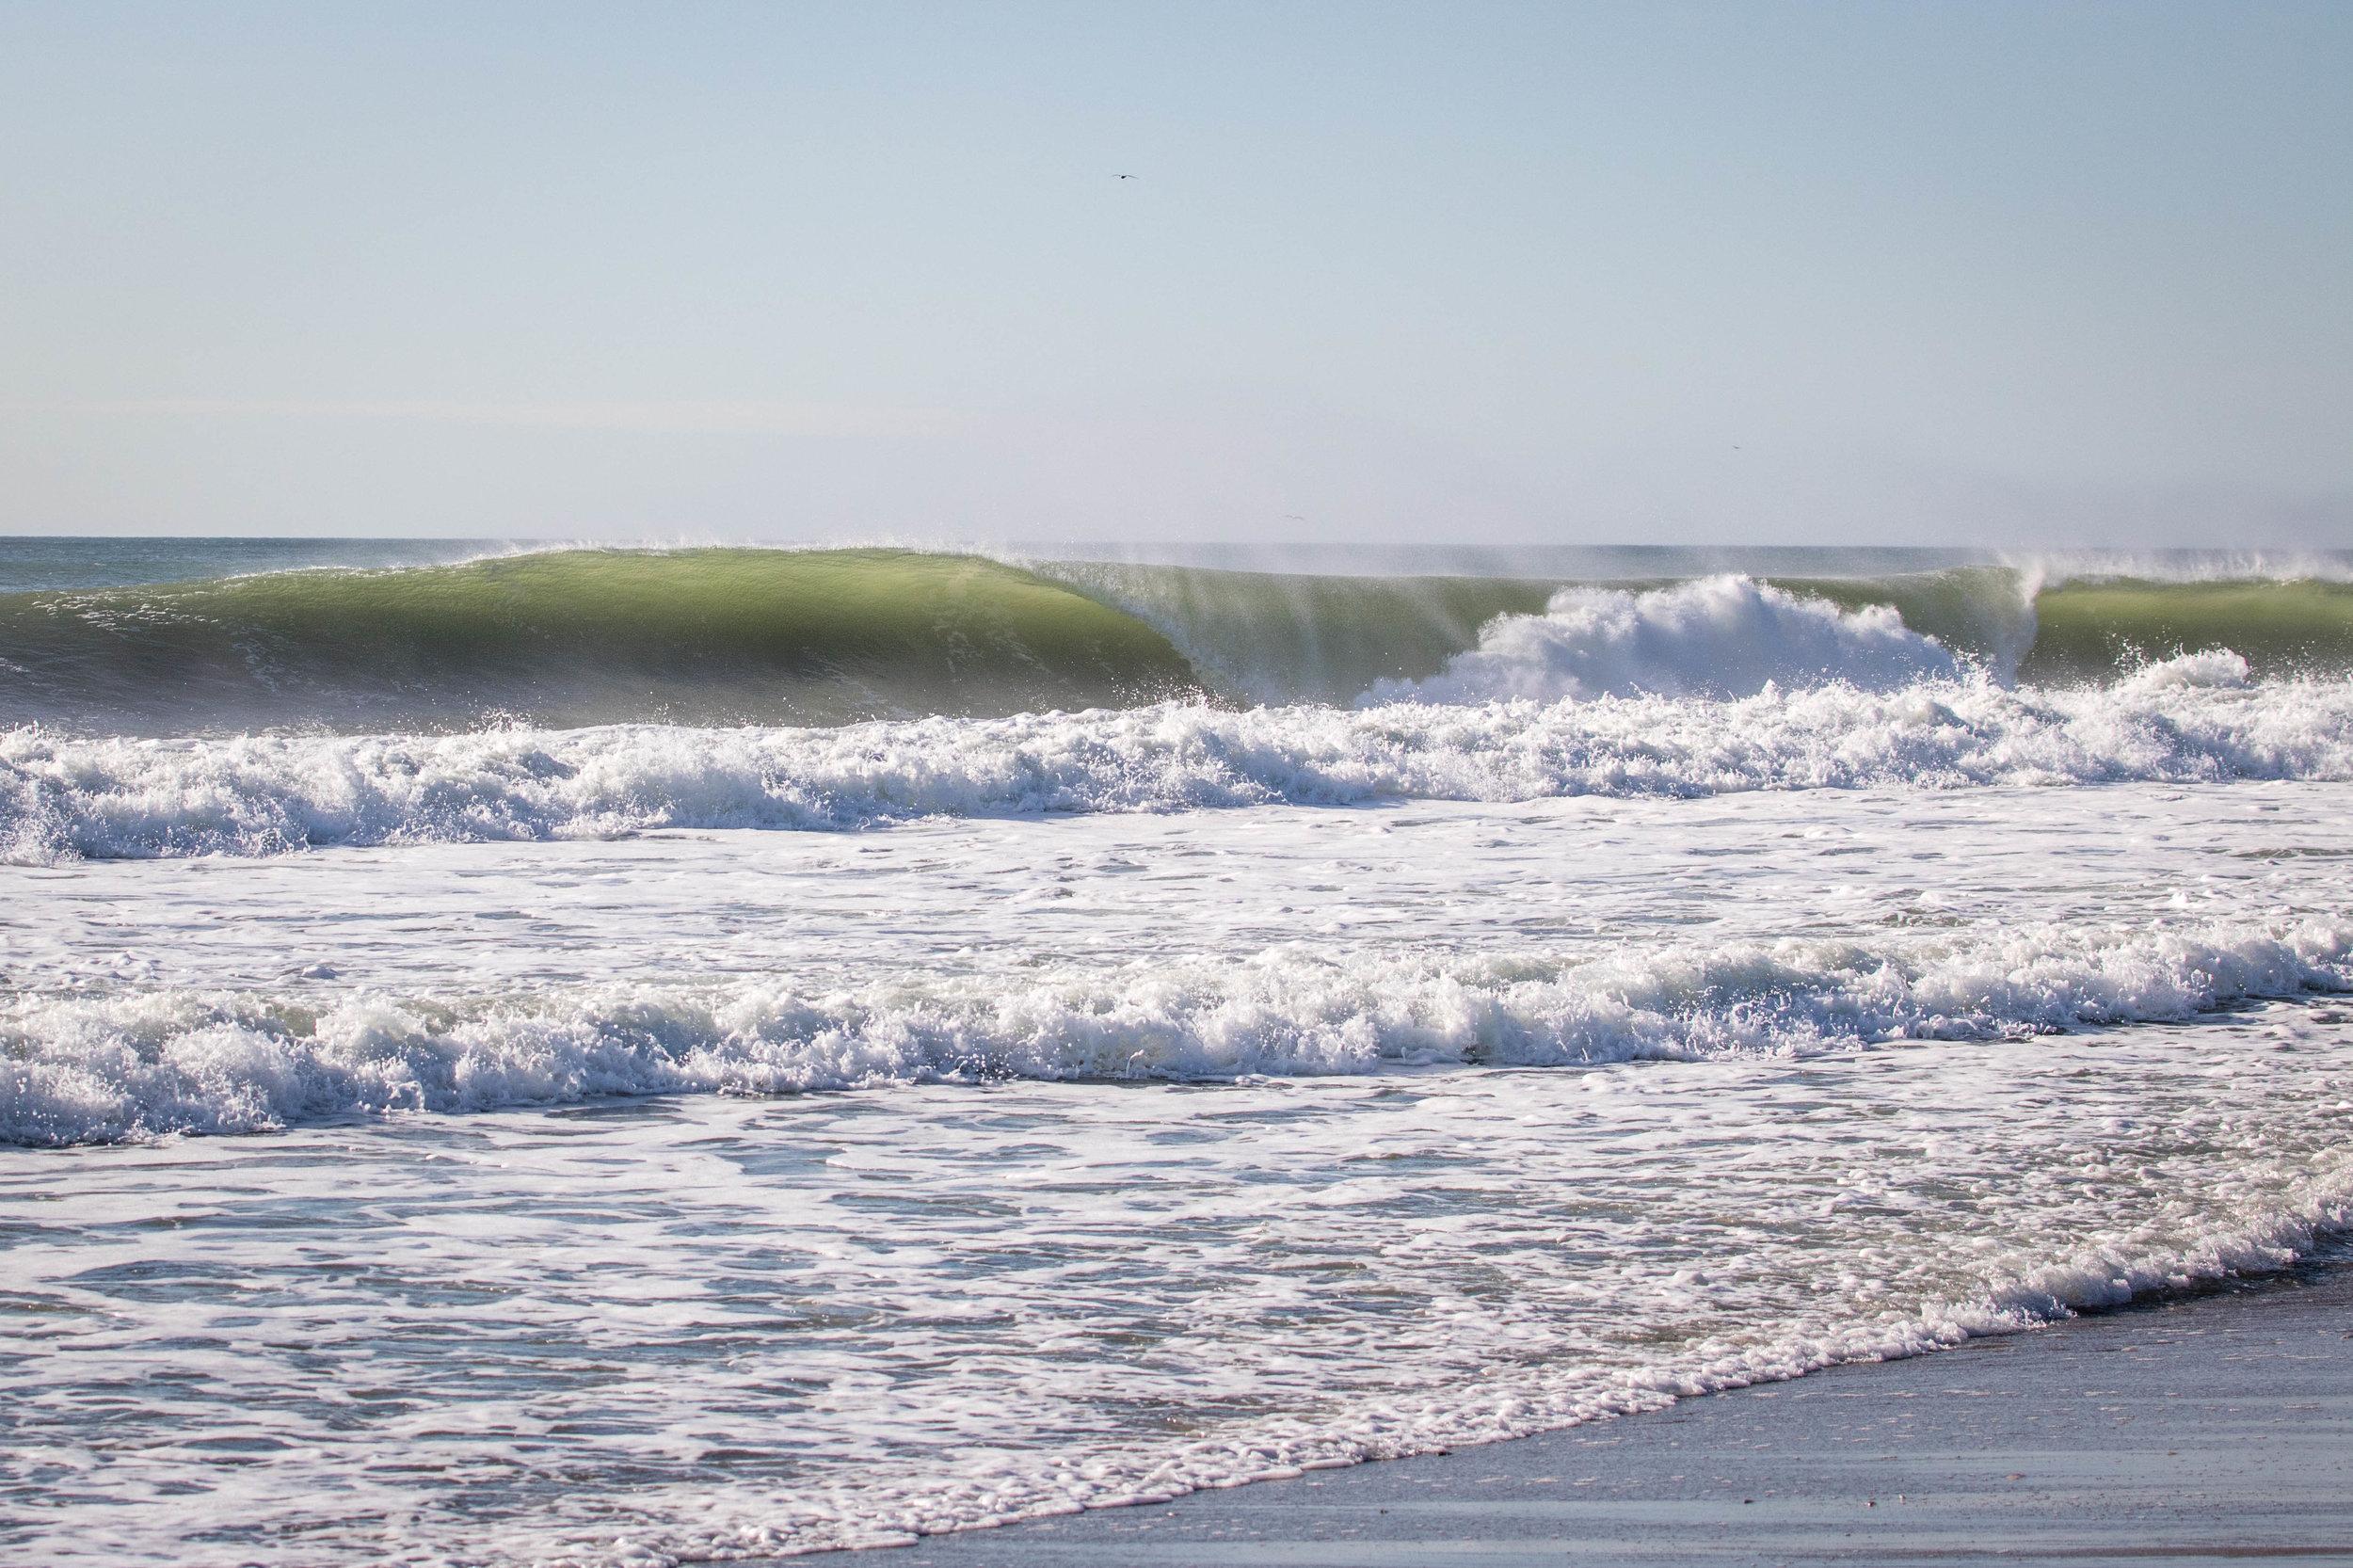 4-26-18 Mantoloking Wave 21.jpg